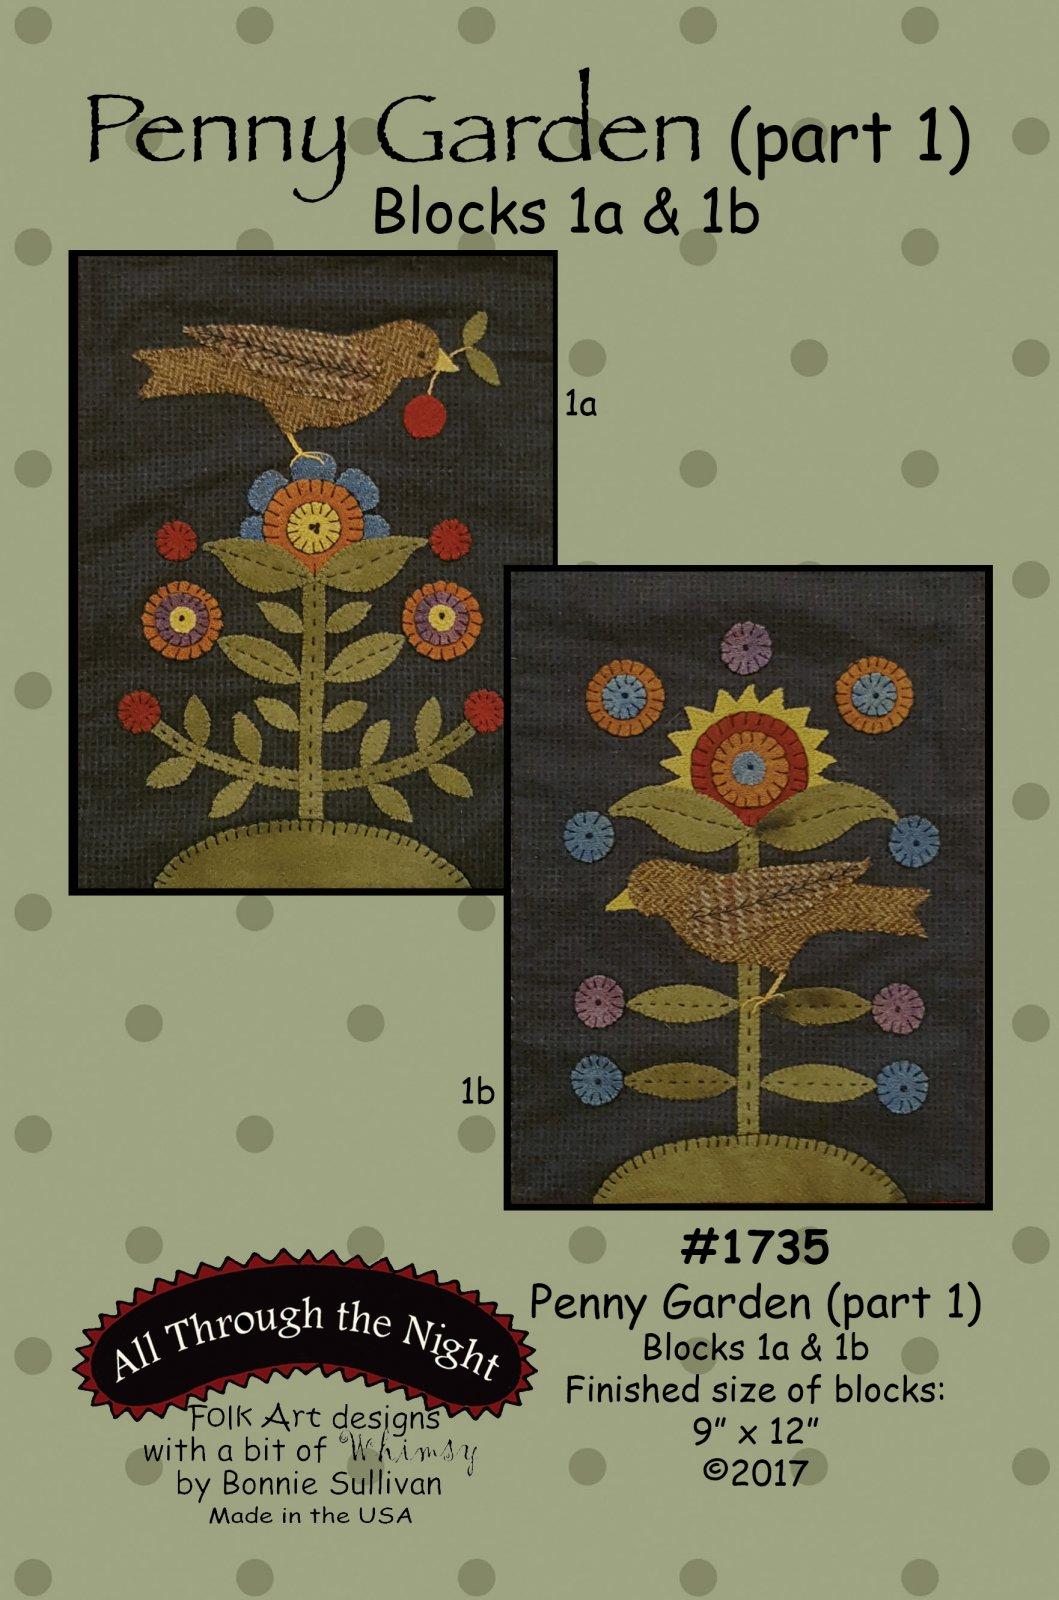 1735 Penny Garden (part 1)